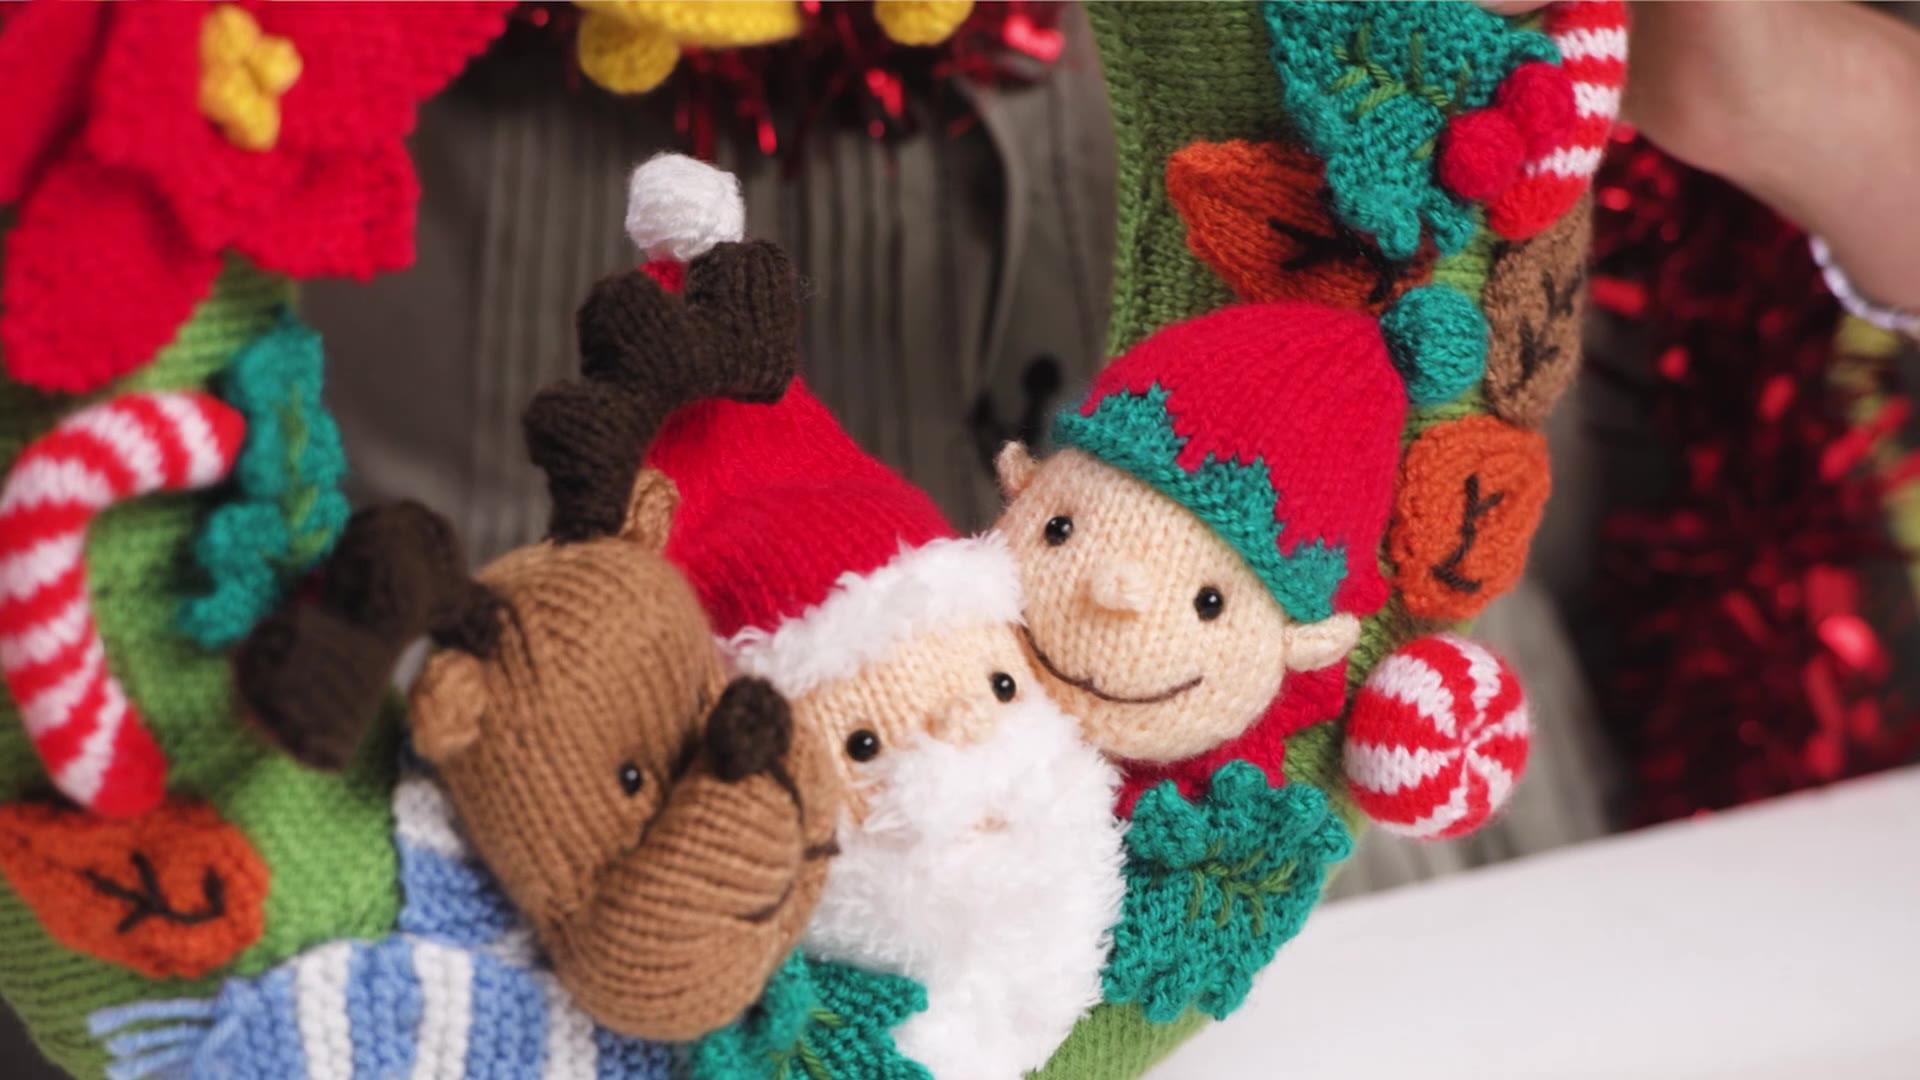 Festive Wreath Knitalong: Our Top Tips